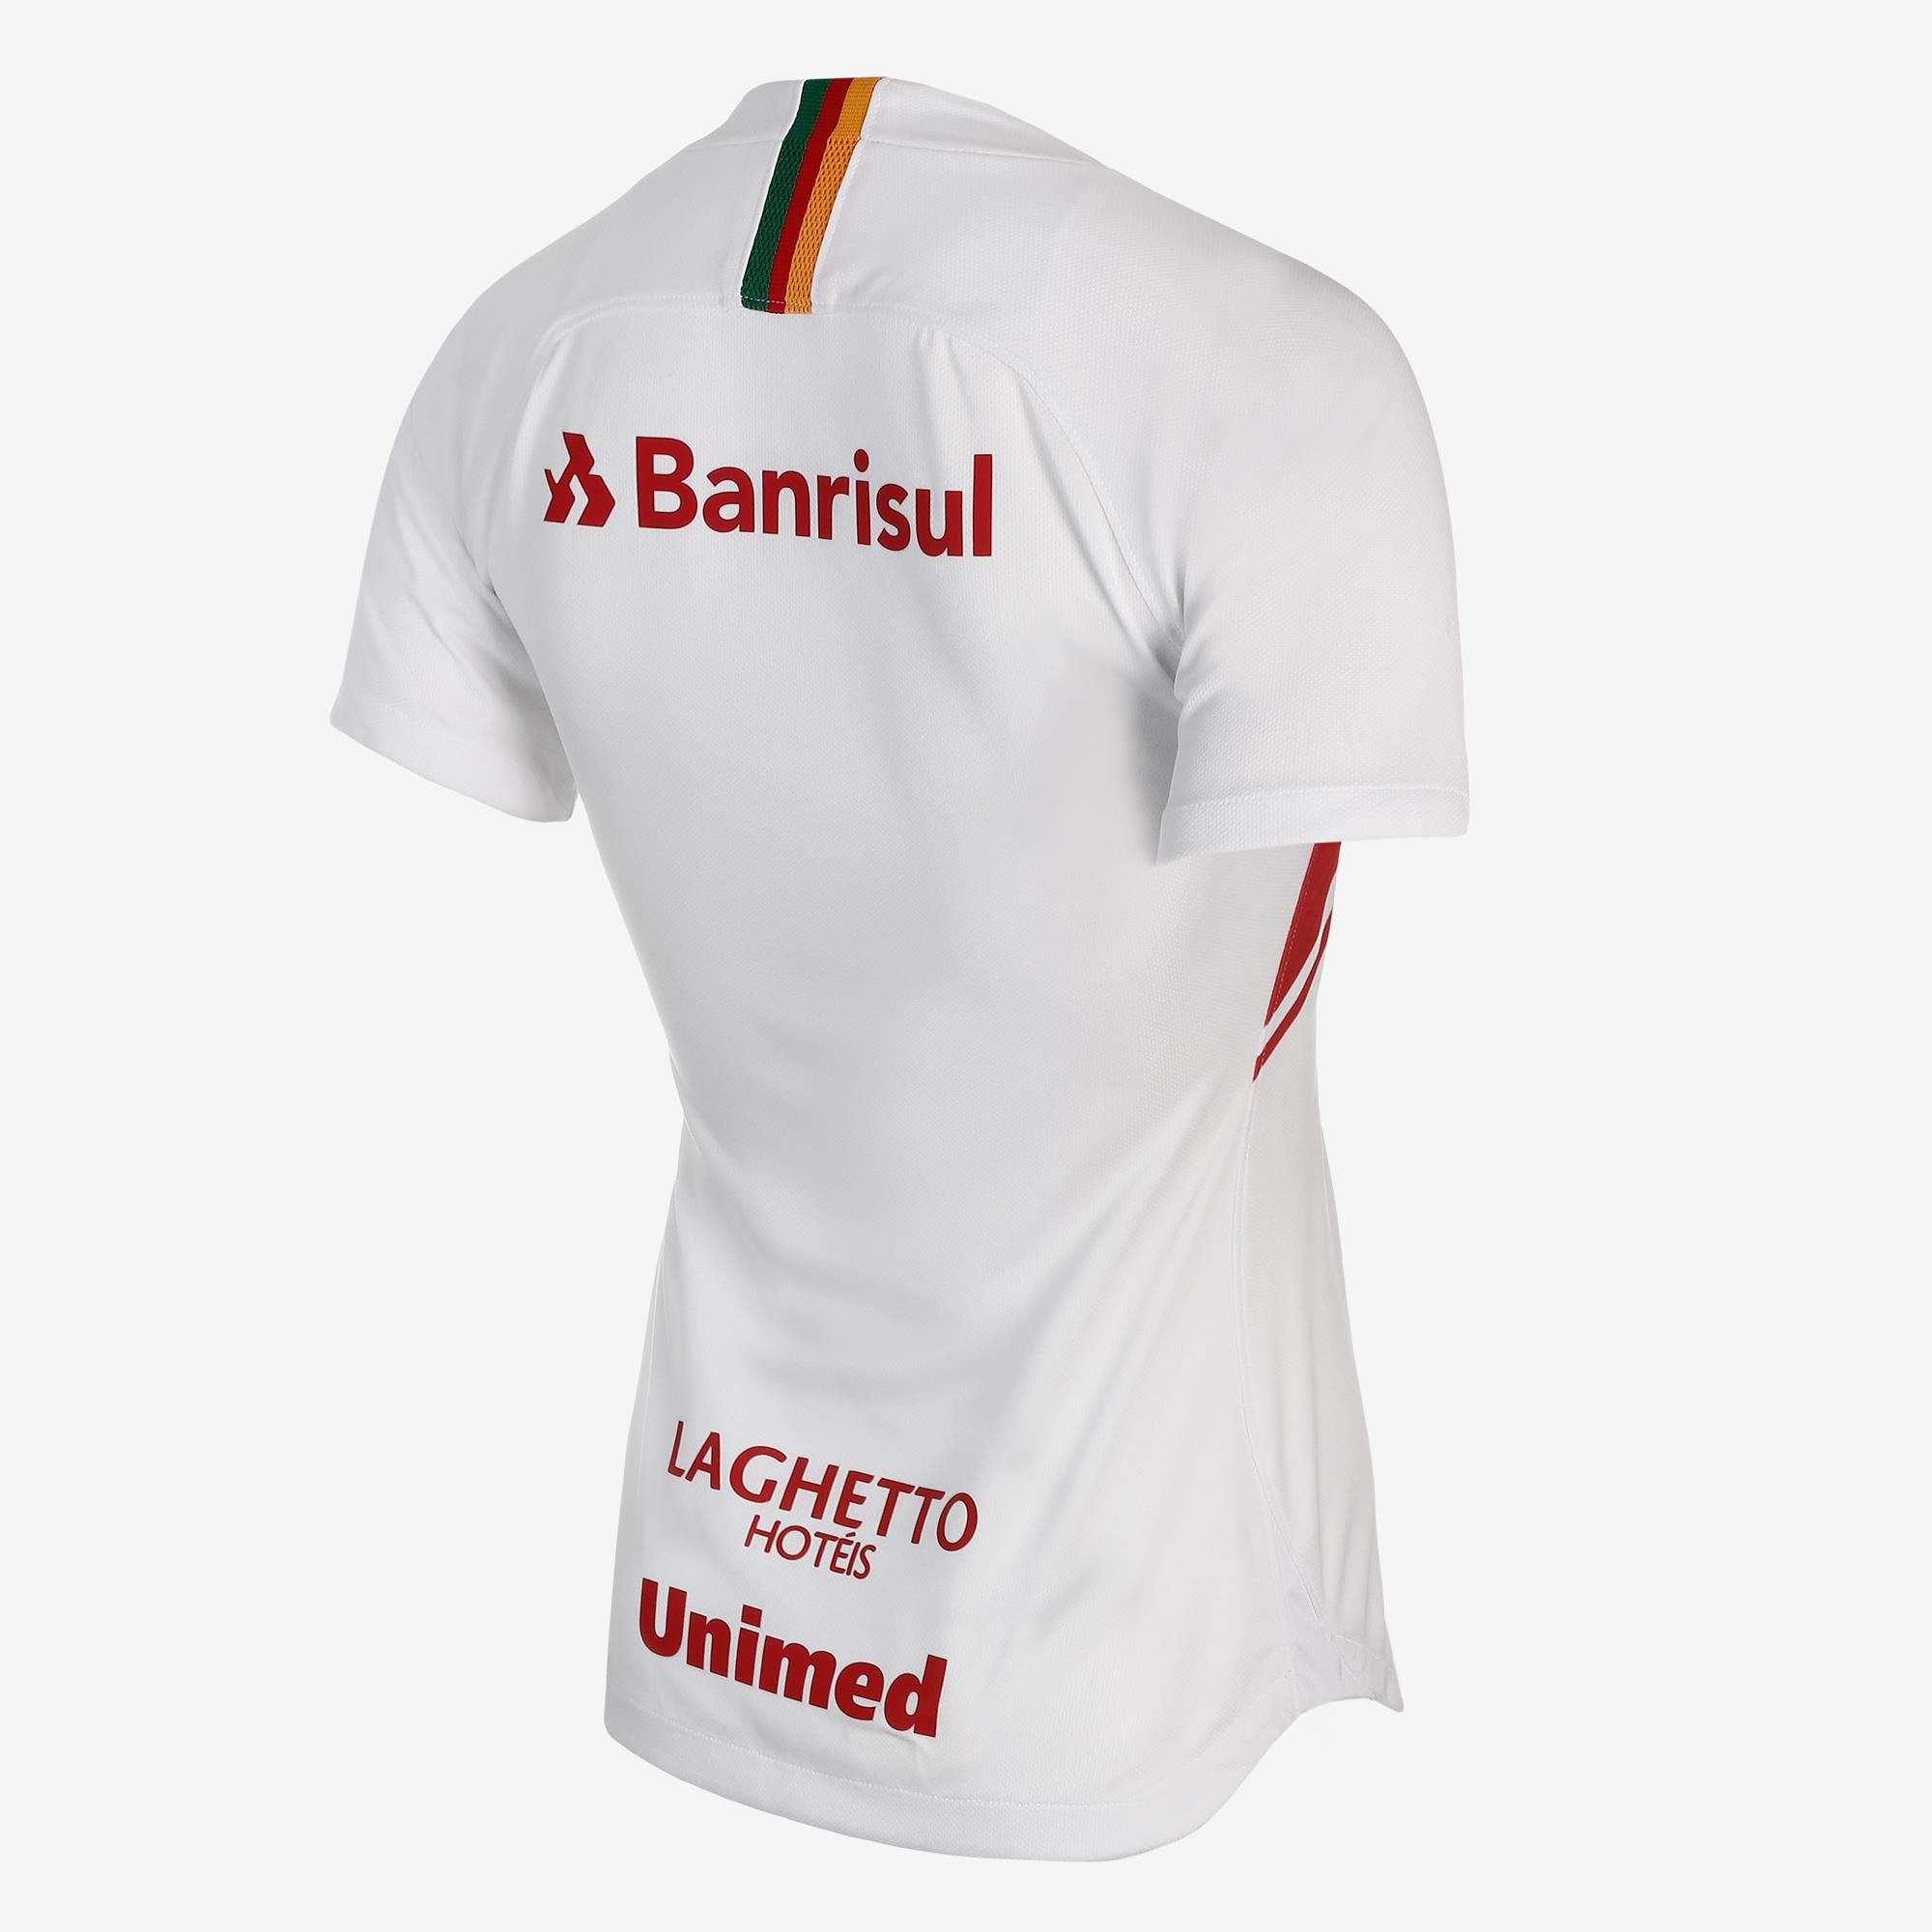 ff0138663 ... Camisa Nike Internacional II 2019/20 Torcedora Feminina - Sportland ...